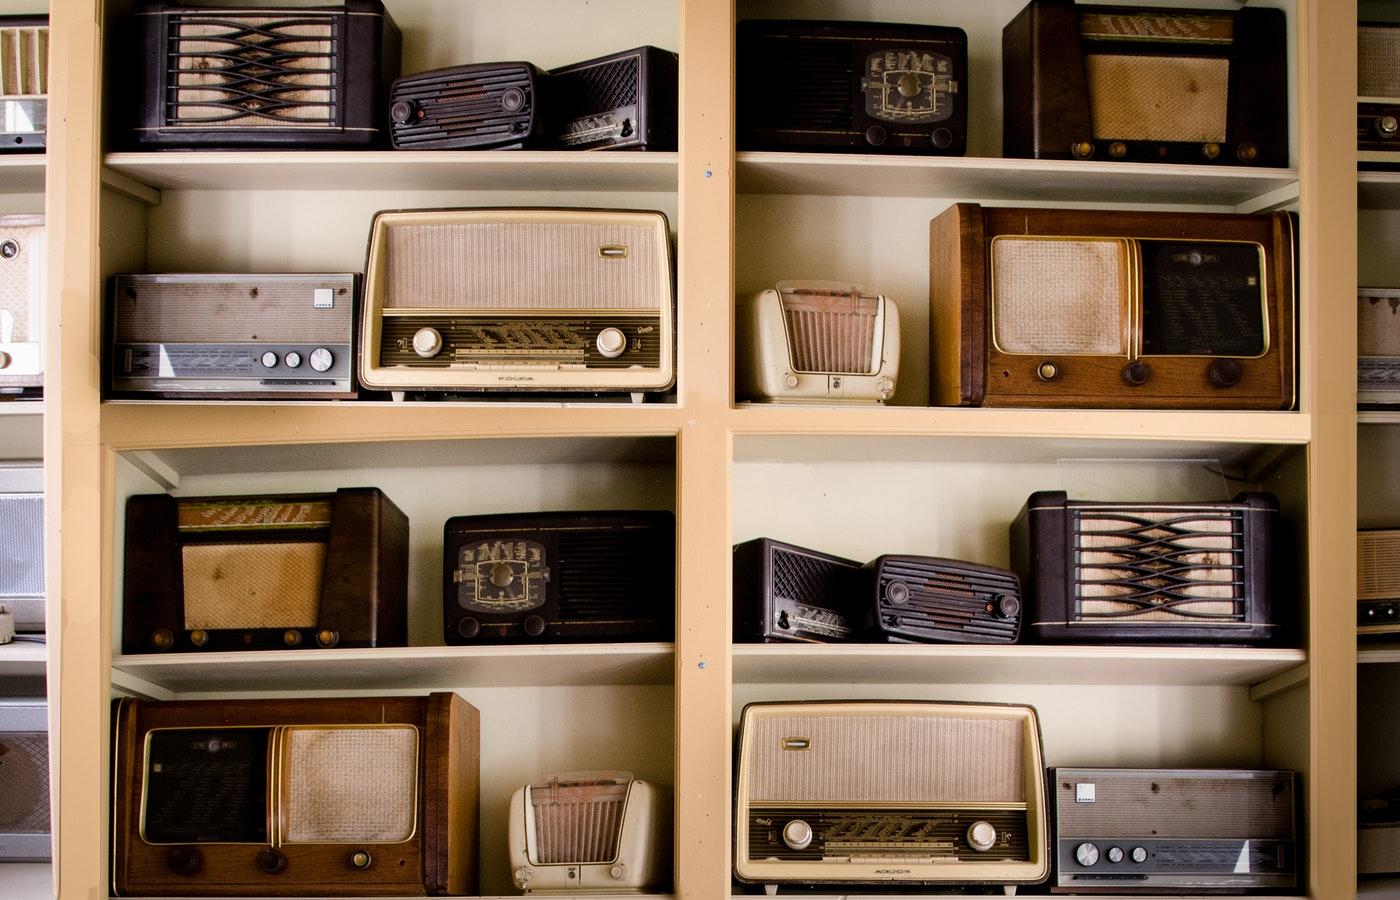 shelves of radios